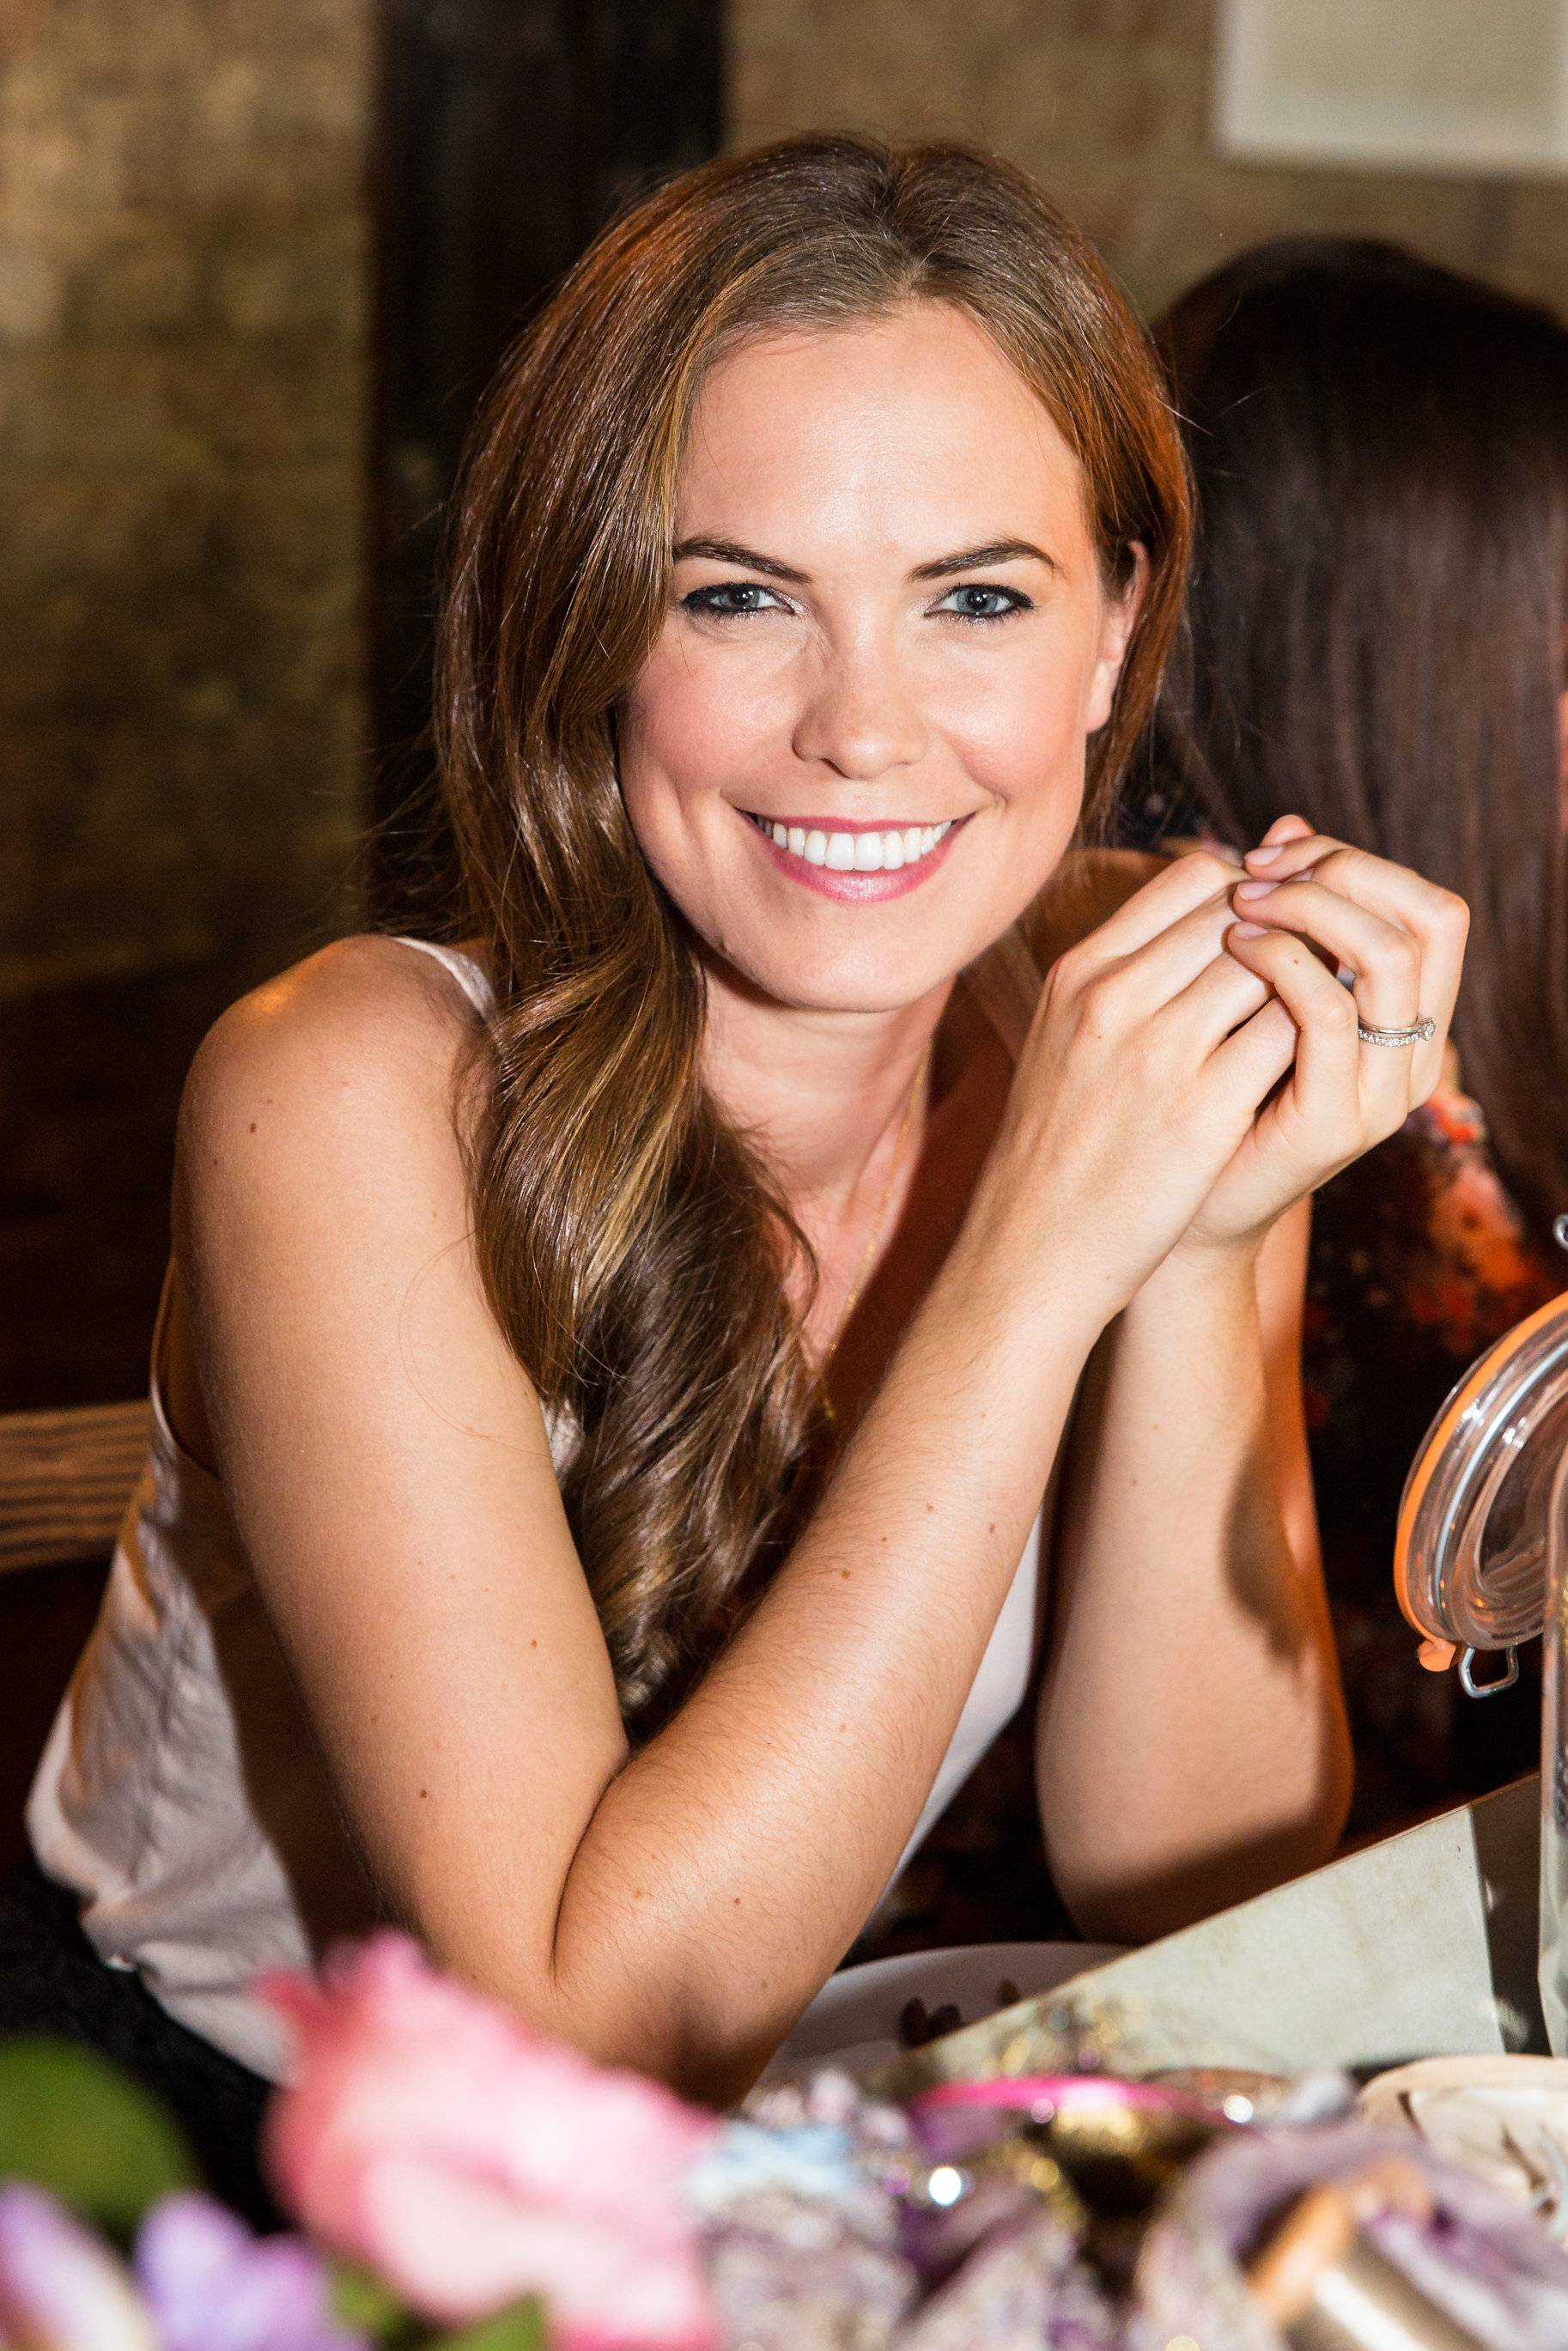 The Social Kitchen | Supper Club | Megan Taylor